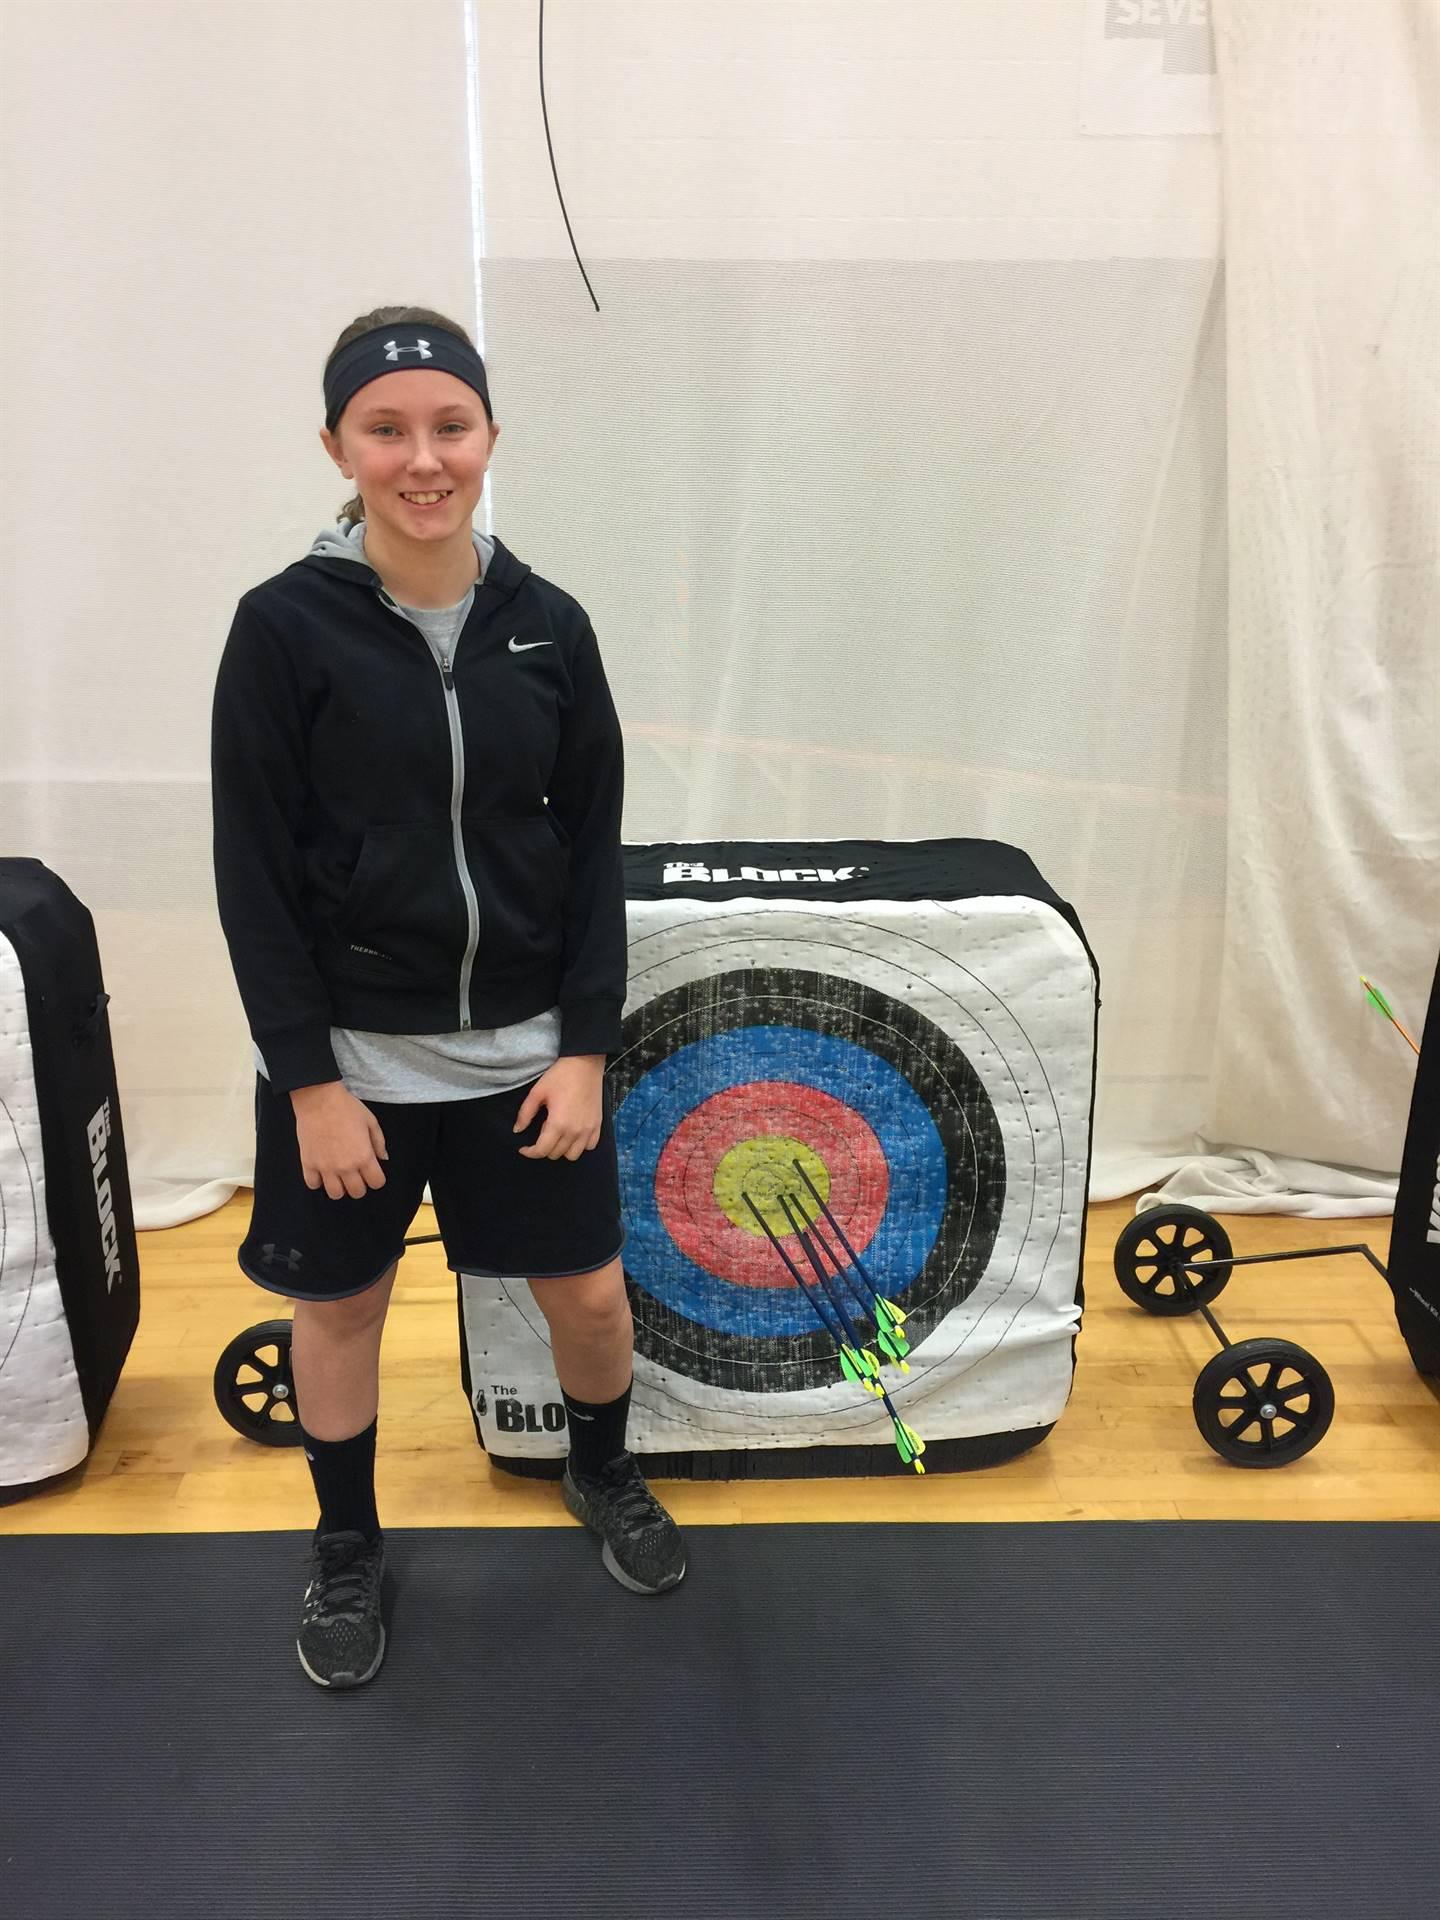 katie gibson archery